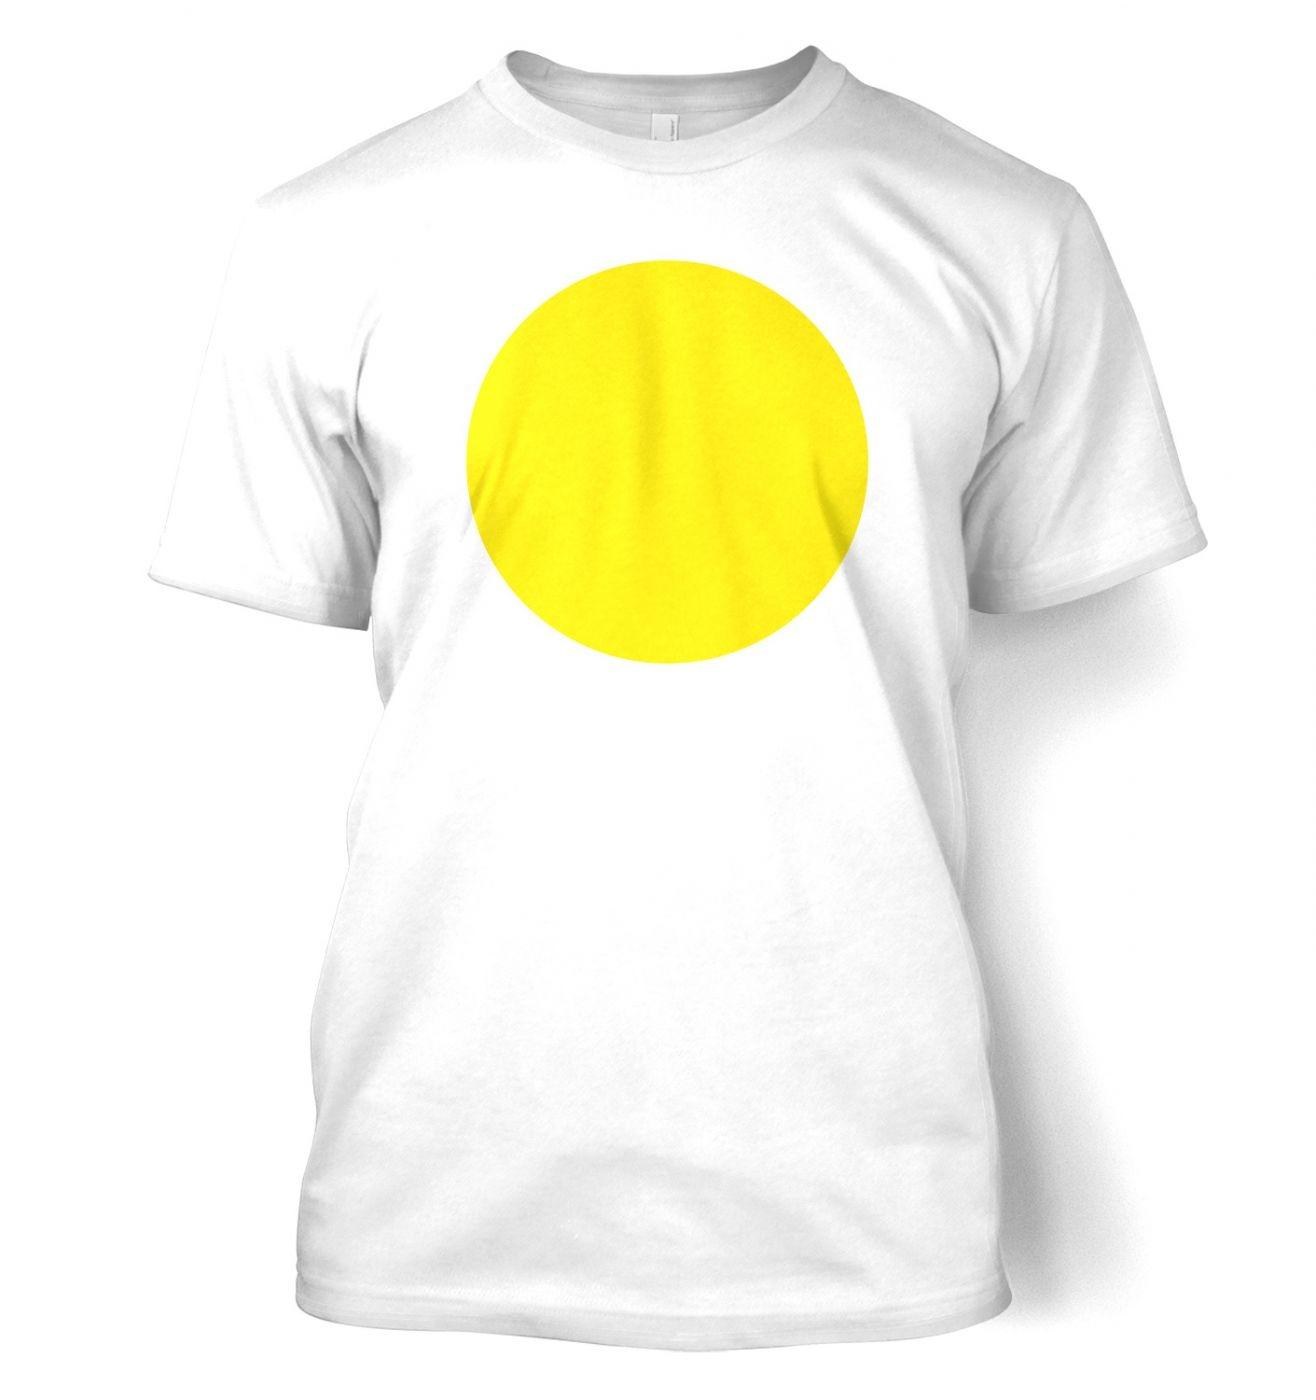 Fried Egg Costume t-shirt